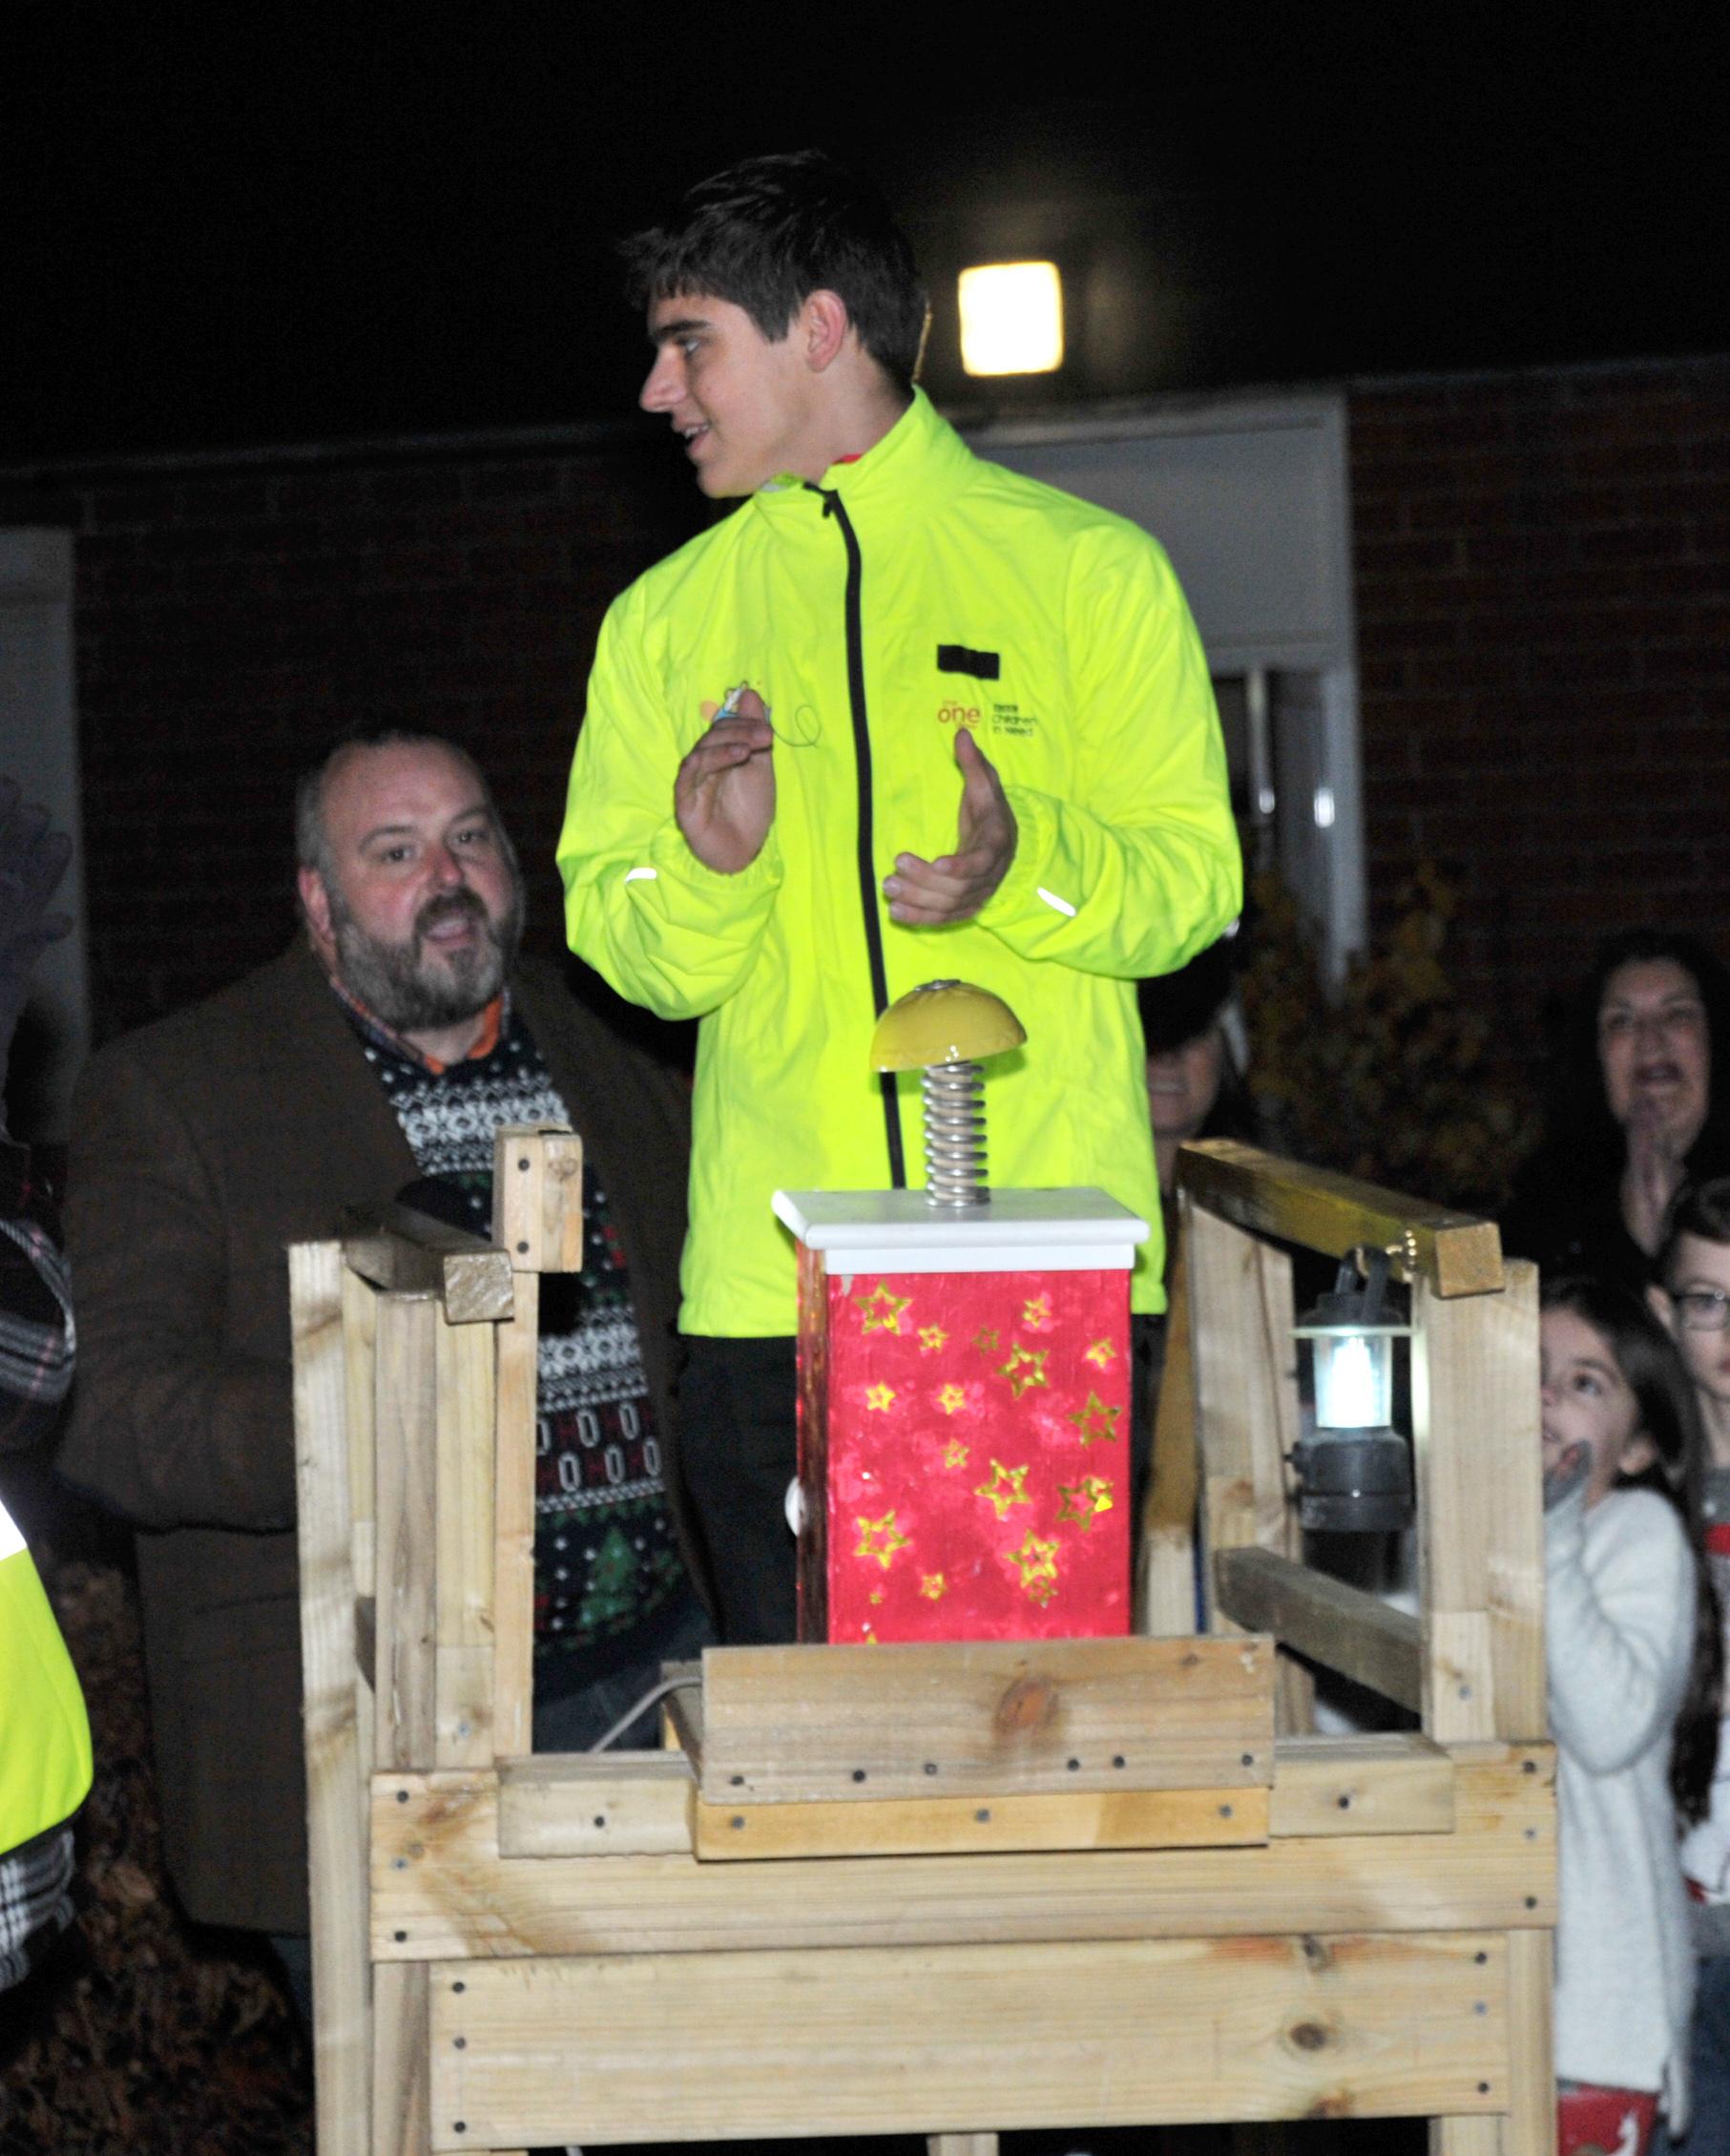 Children in Need Rickshaw rider Tom, 17, helps switch on Wroughton lights